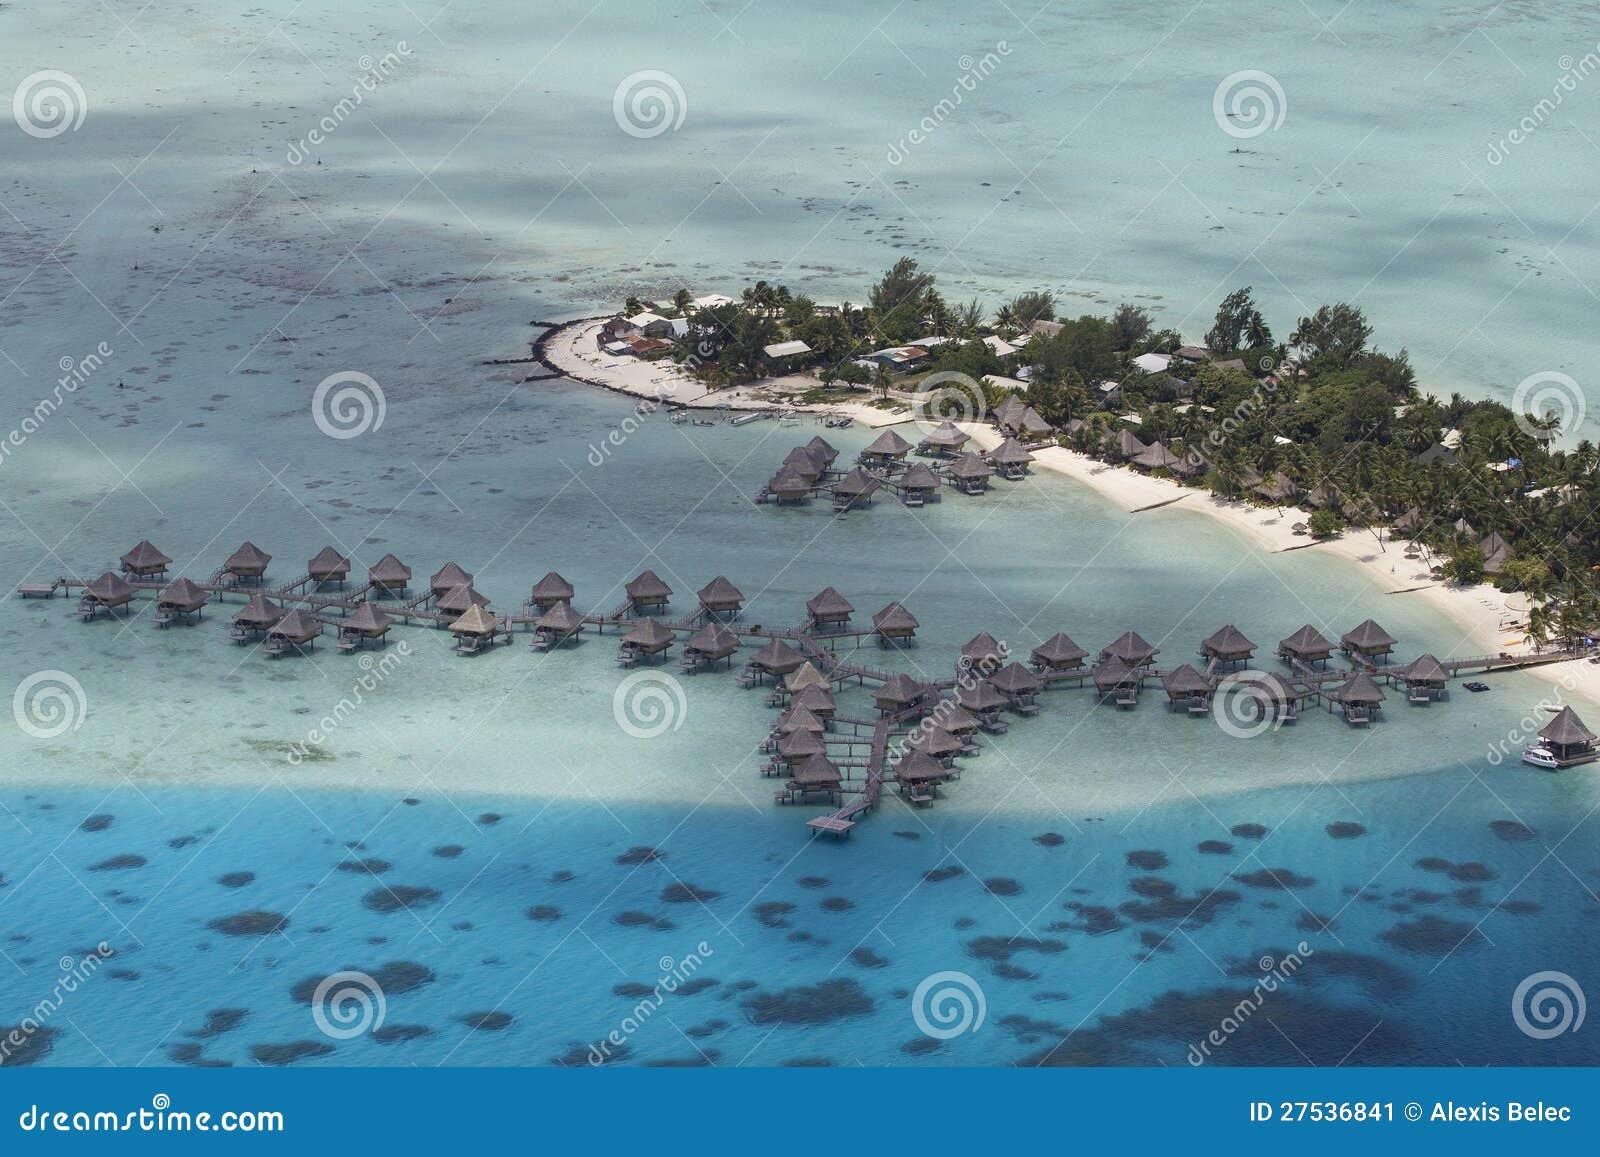 fransk polynesia